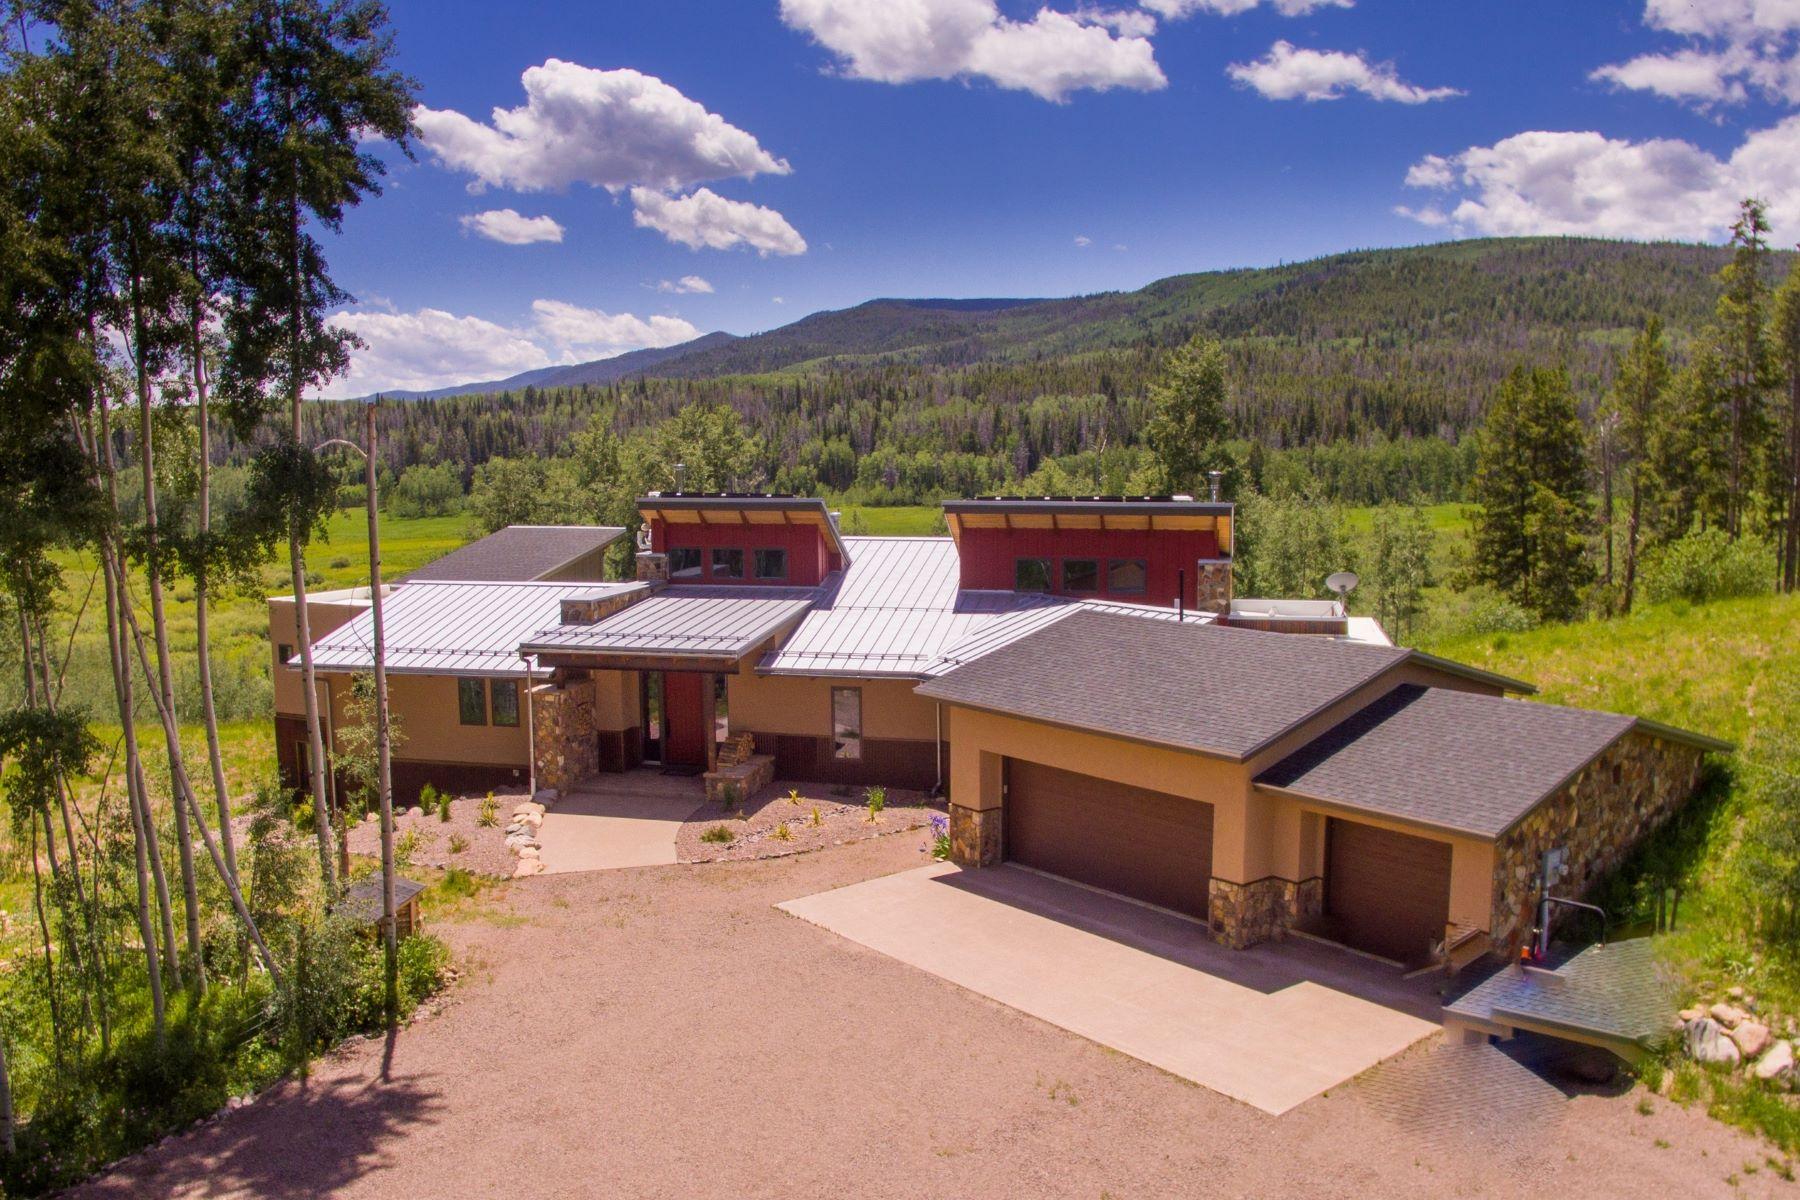 Single Family Homes for Sale at Greenridge Ranch Contemporary Home 20850 Cheyenne Trl Oak Creek, Colorado 80467 United States